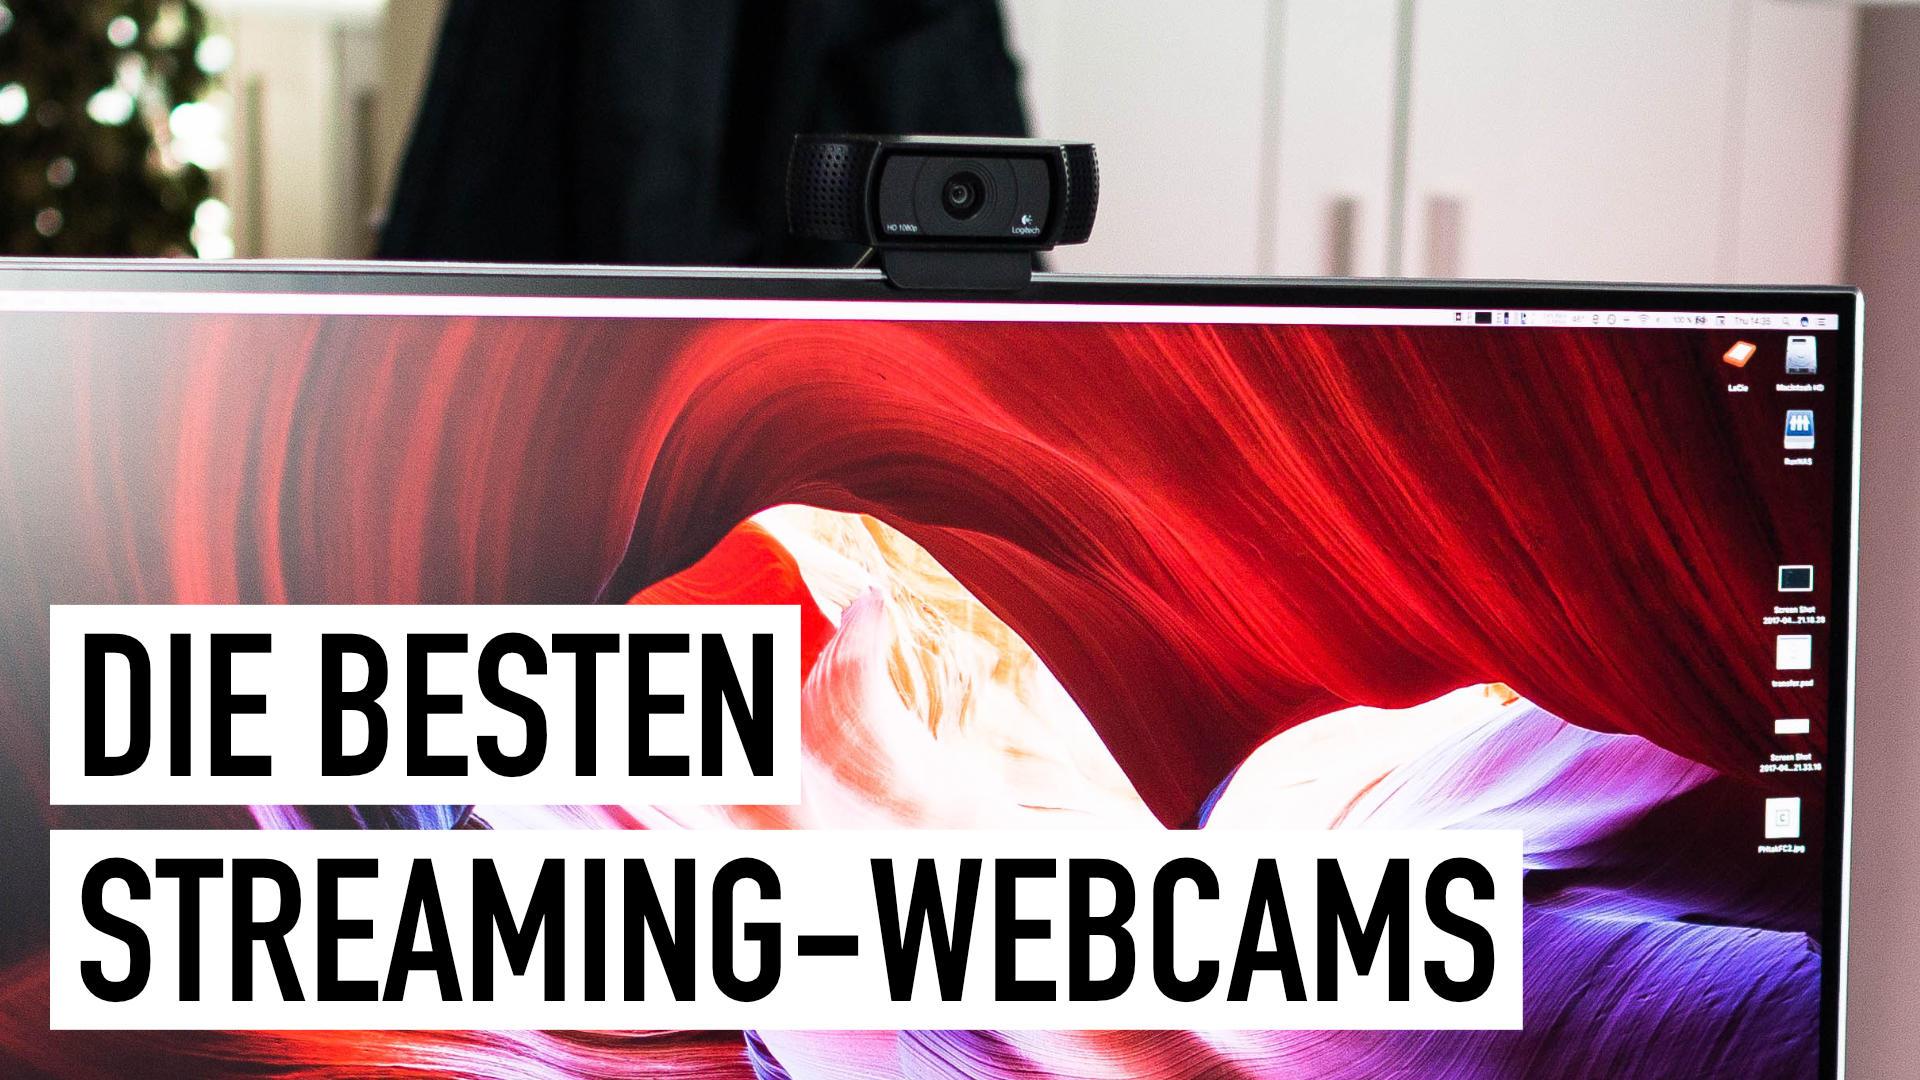 Facecam: Die besten Streaming-Webcams und -Kameras